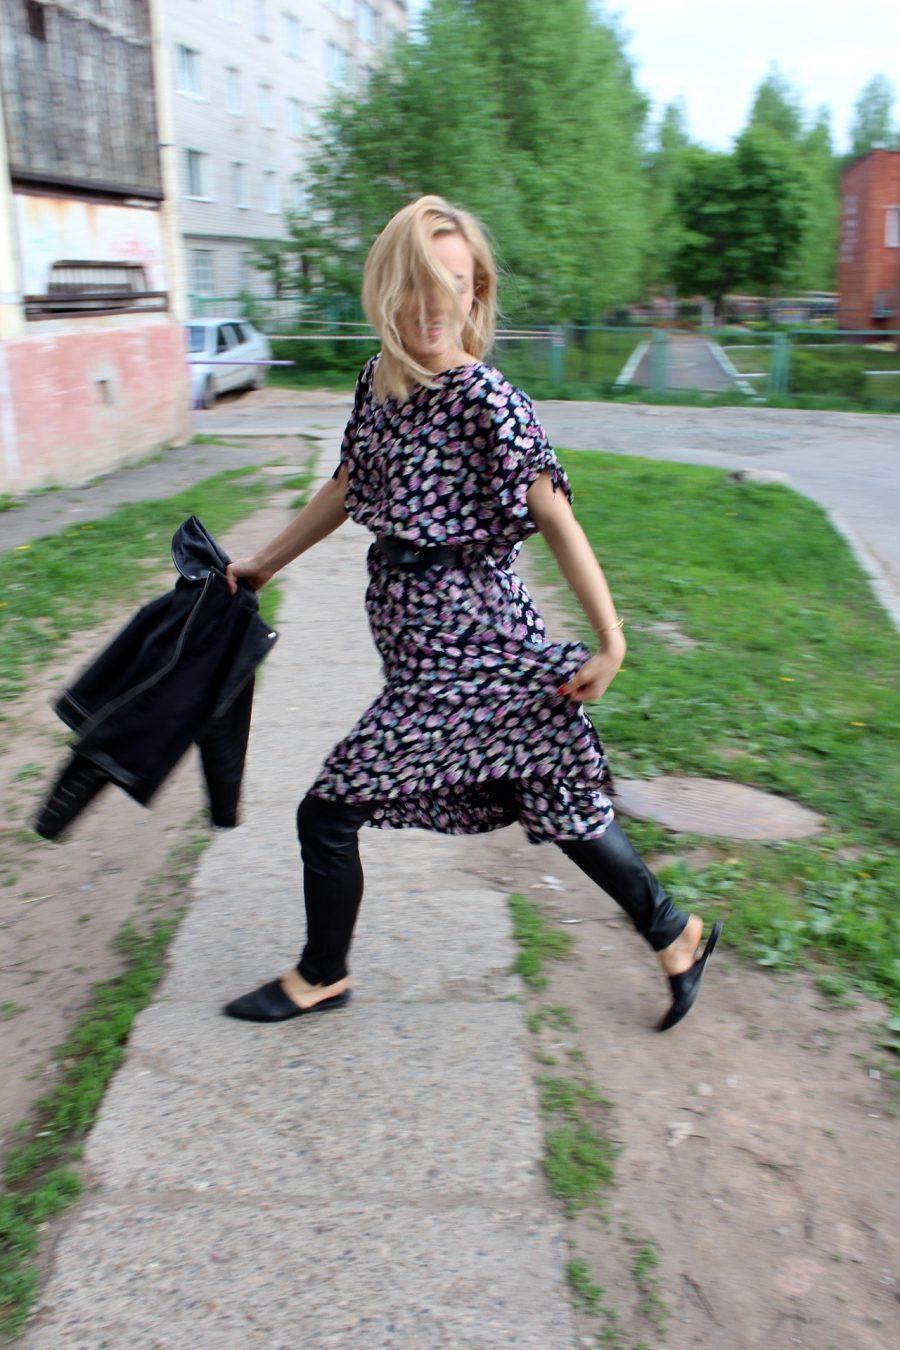 Lederhose und Kleid